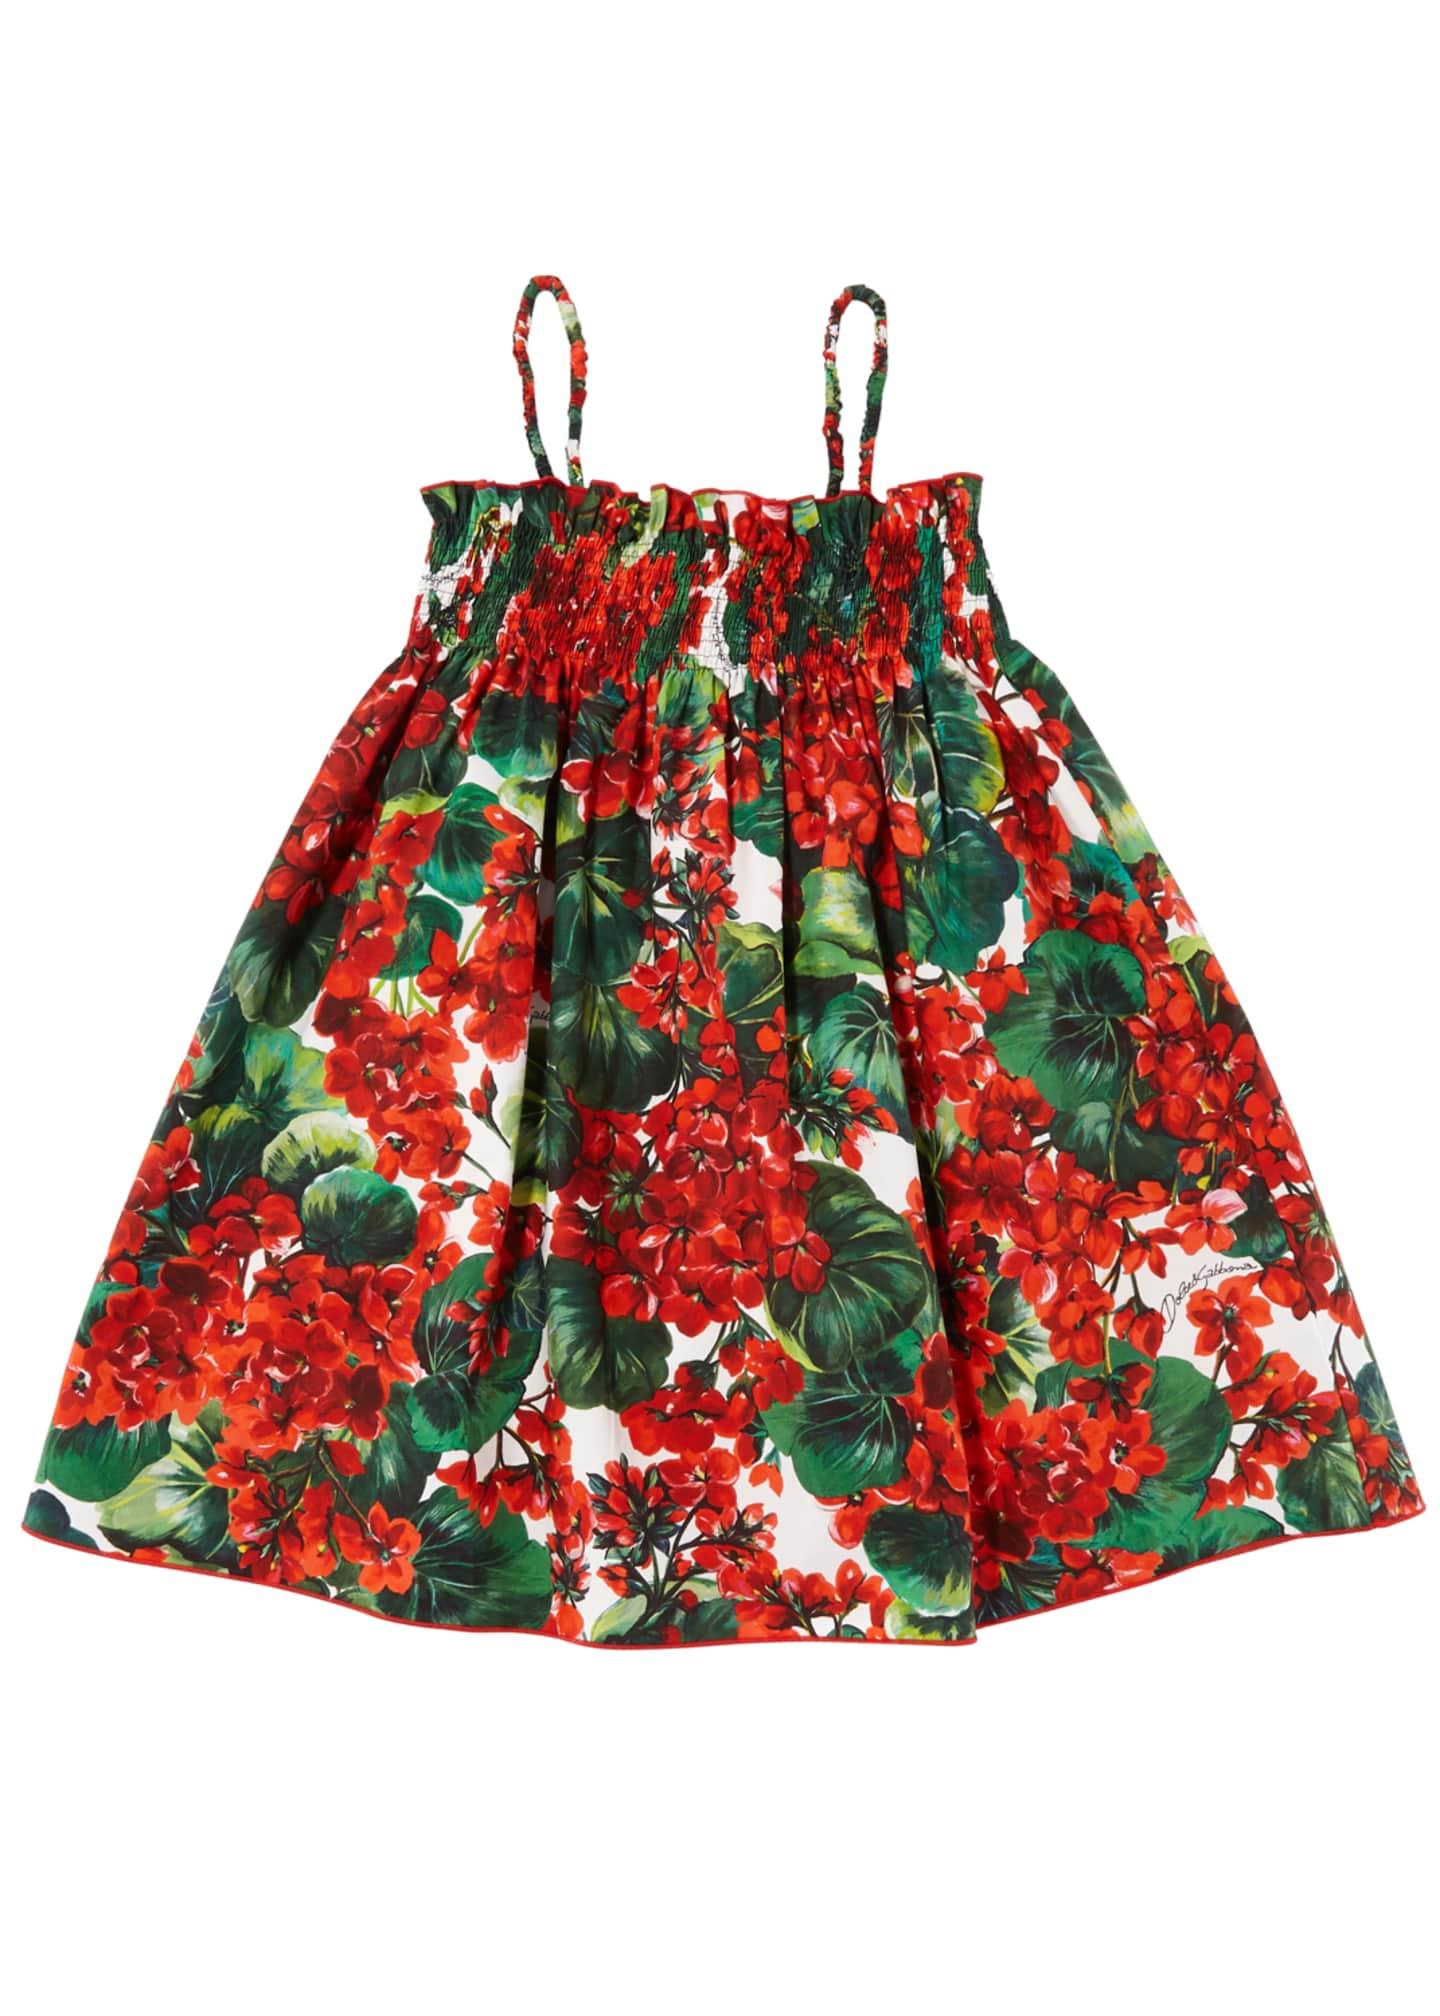 Dolce & Gabbana Geranium Print Smocked Poplin Dress,